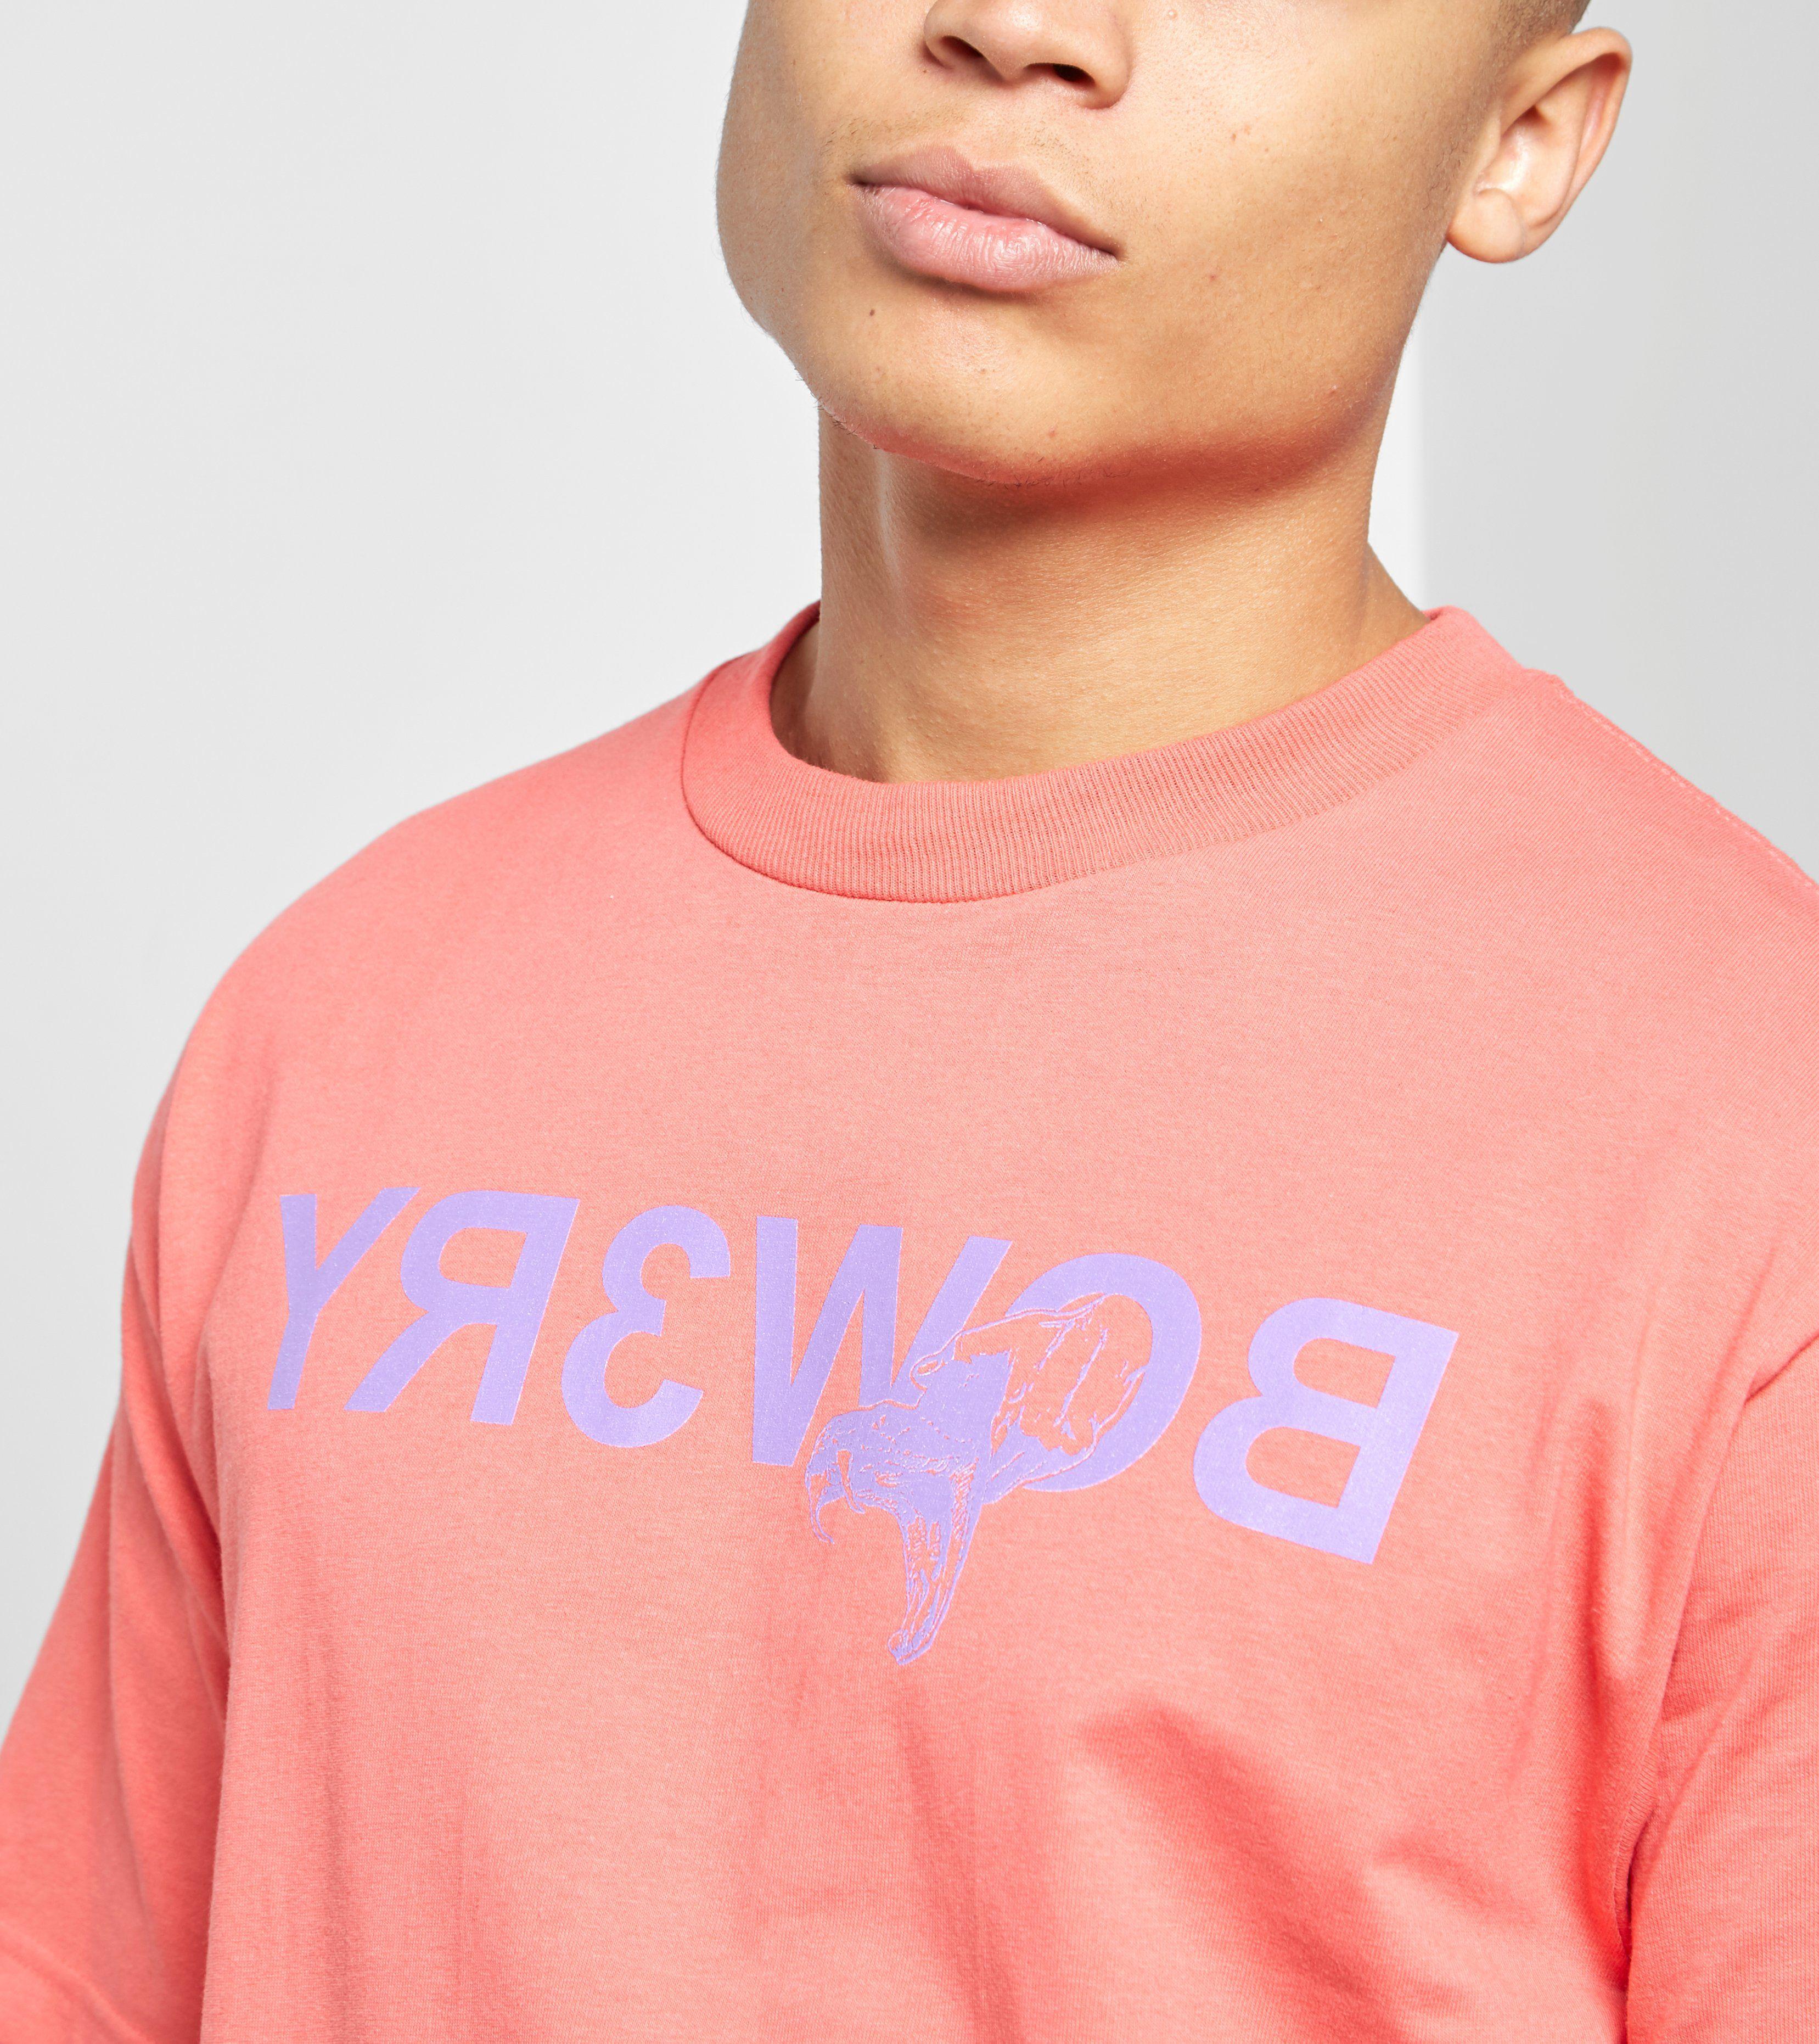 BOW3RY Venom T-Shirt